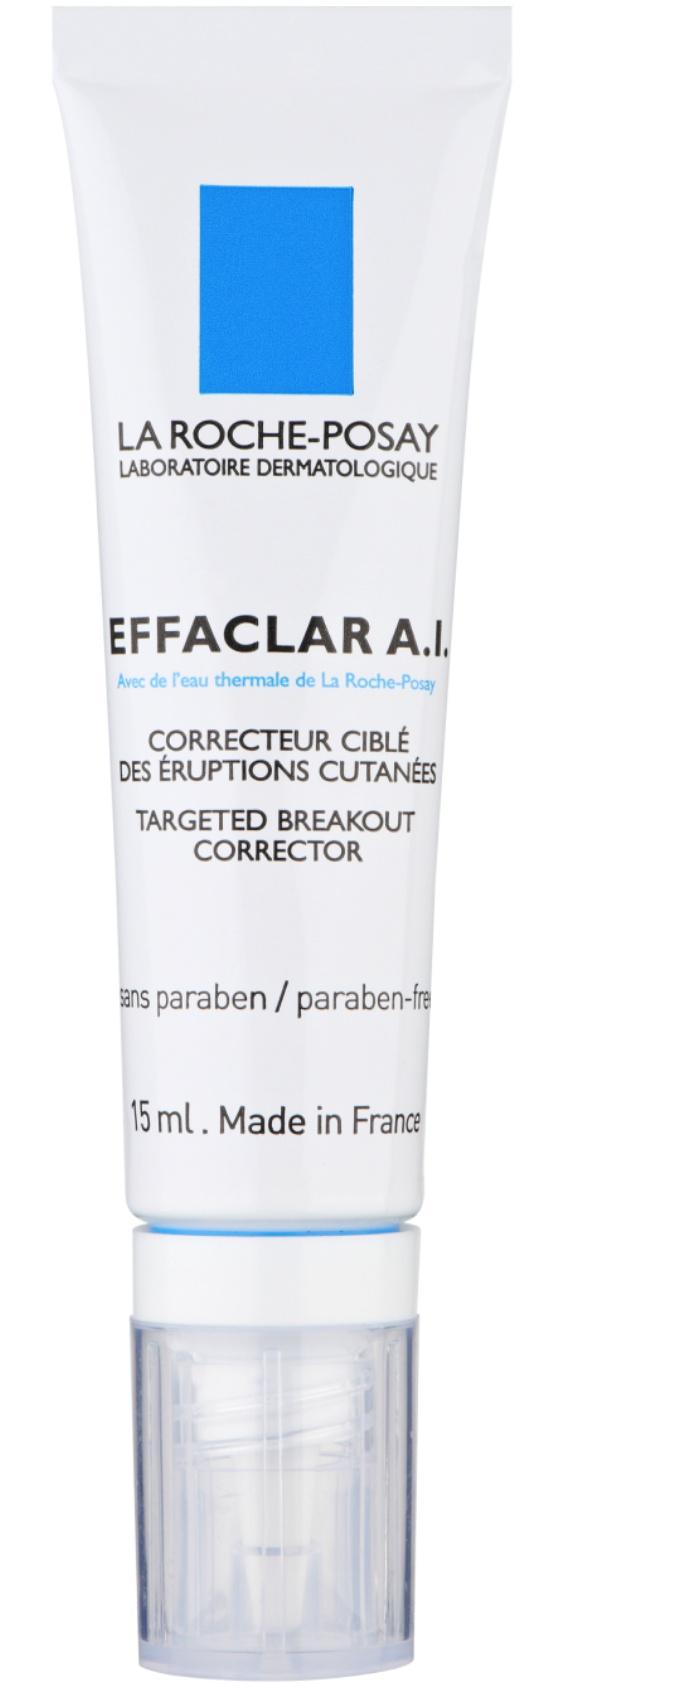 La Roche-Posay Effaclar A.I. Breakout Corrector